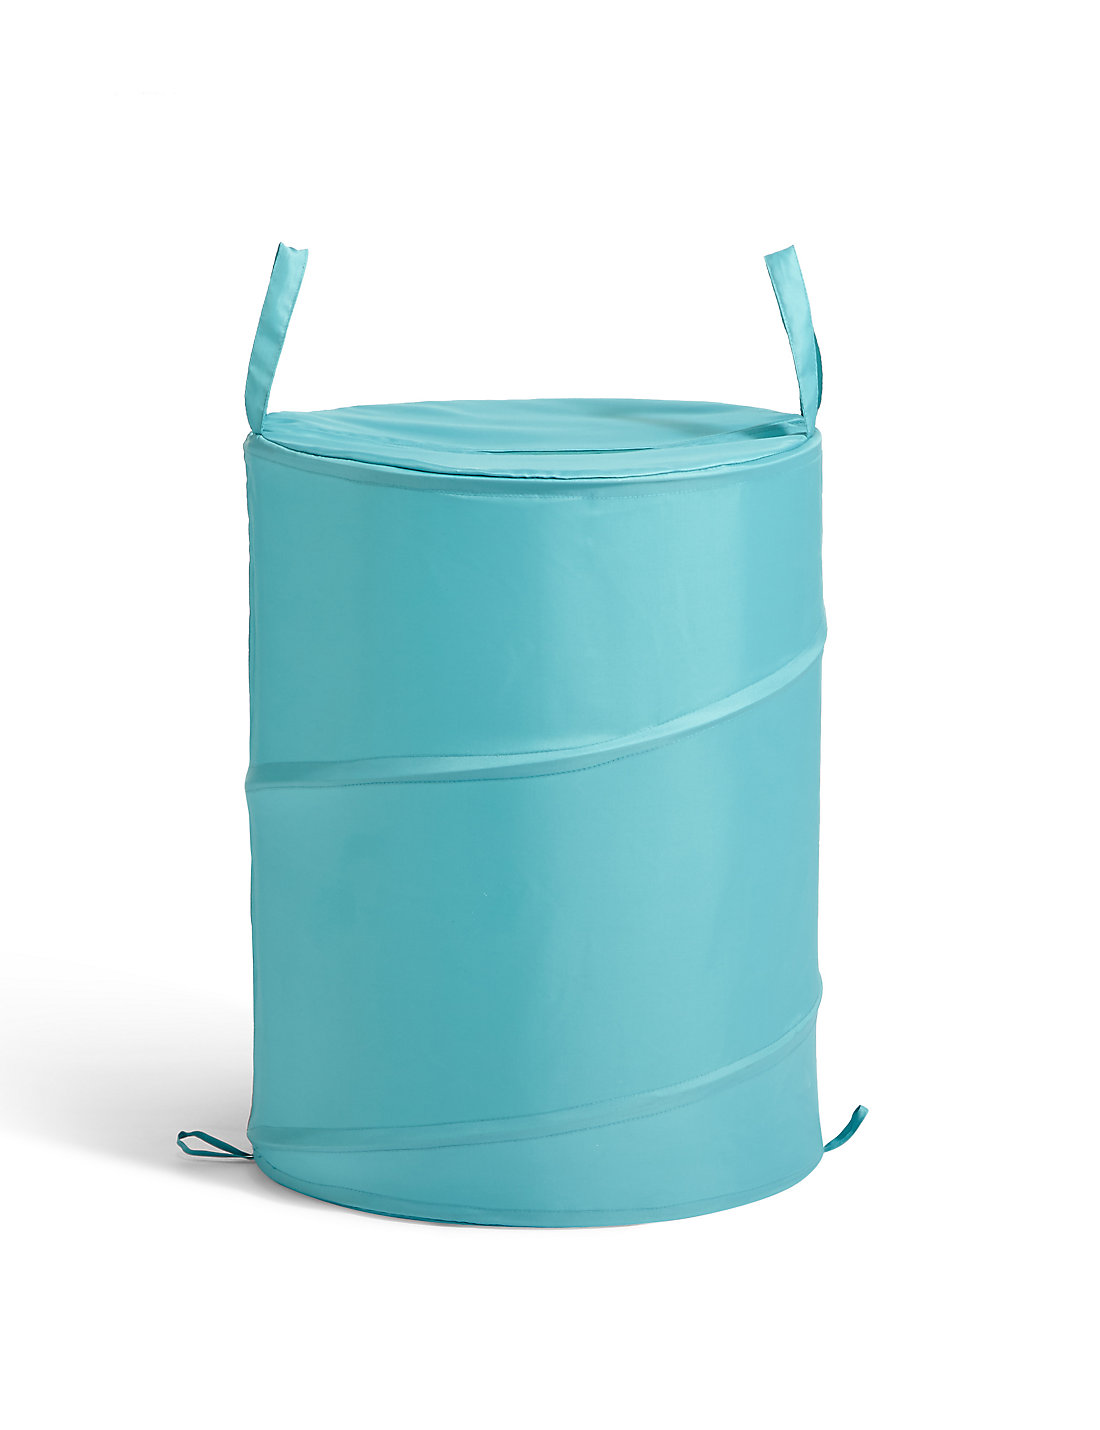 Pop Up Laundry. Bathroom Storage   Freestanding  amp  Corner Storage Units   M amp S